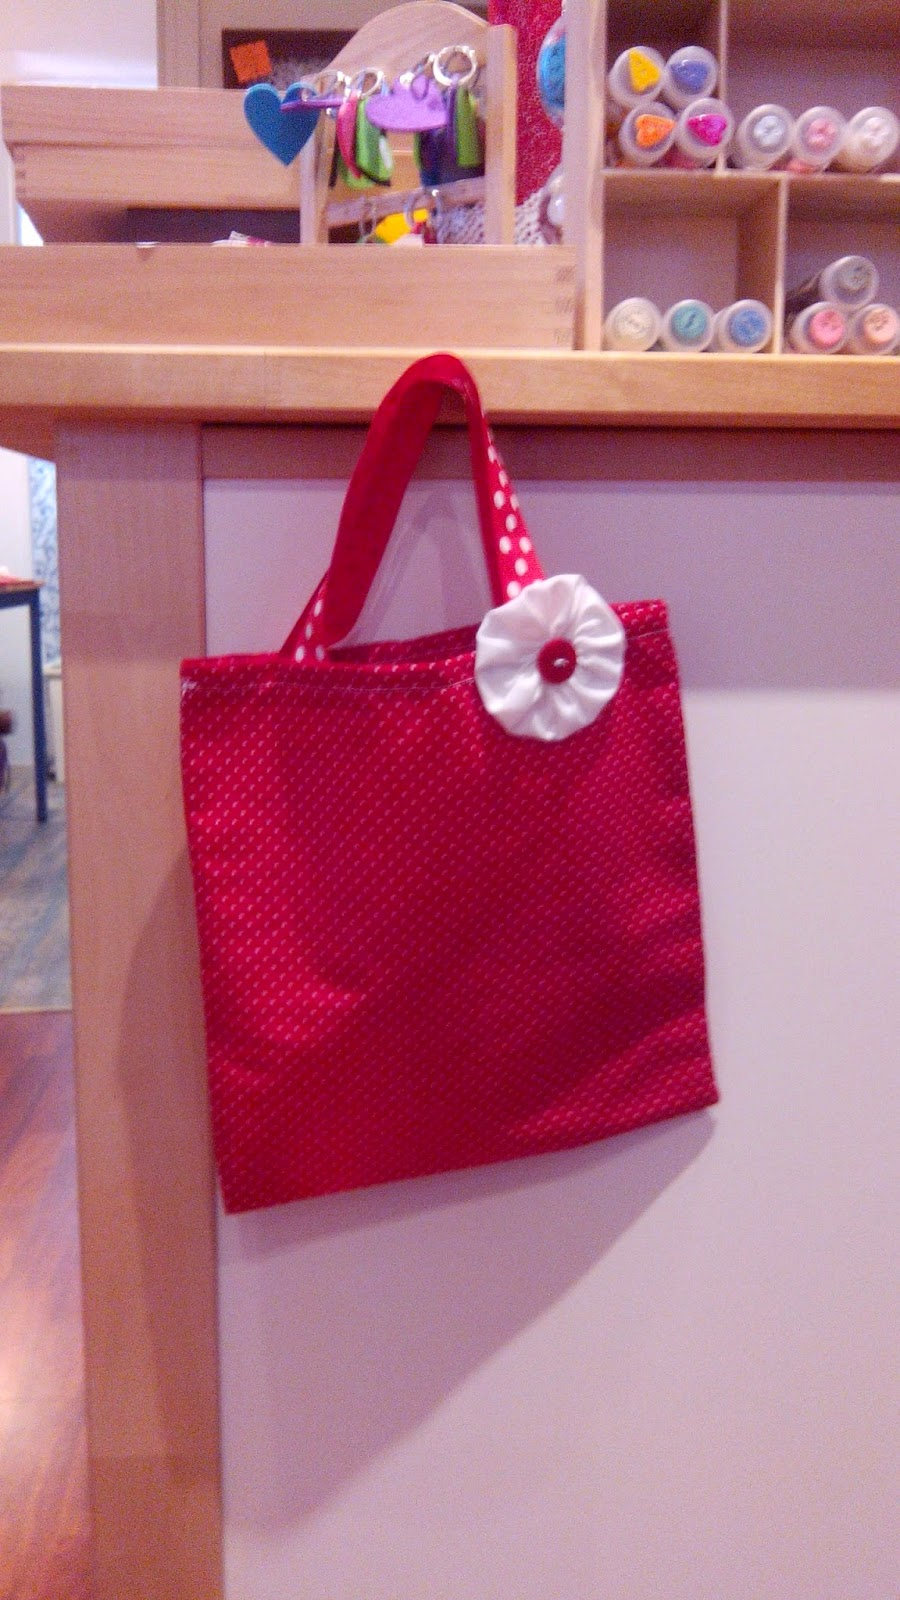 Couture en atelier sac tote bag rouge